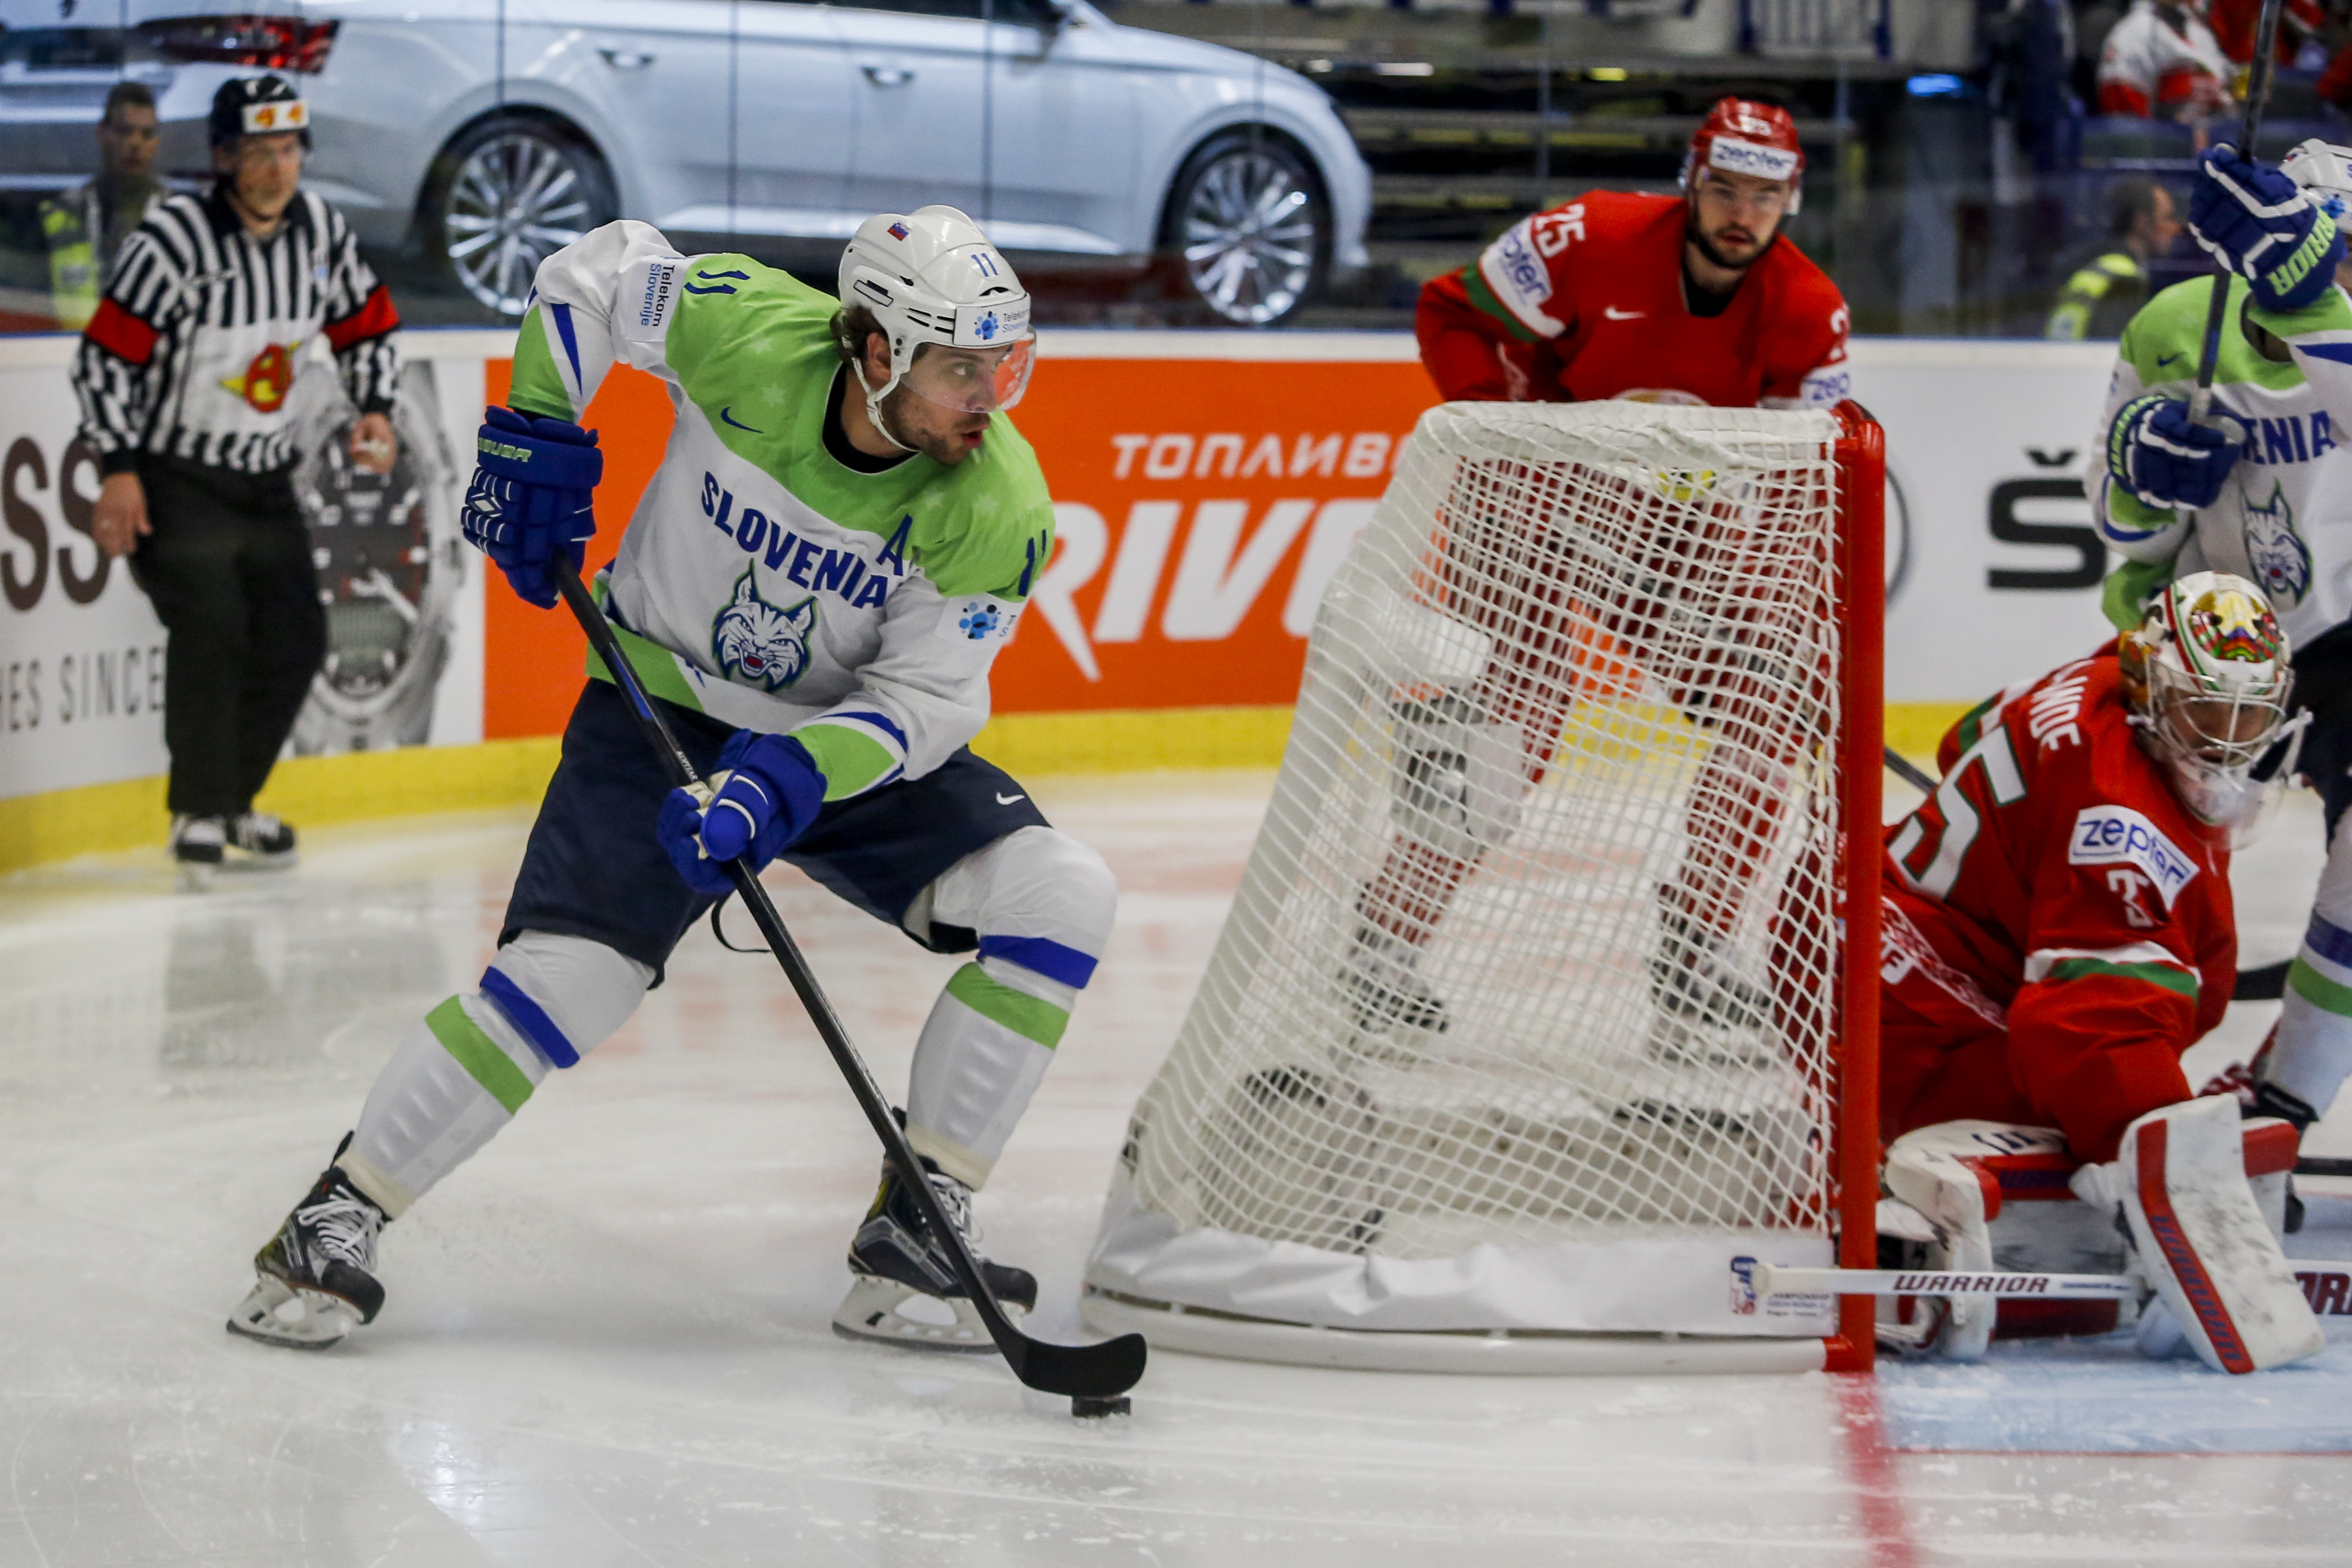 Belarus v Slovenia - 2015 IIHF Ice Hockey World Championship